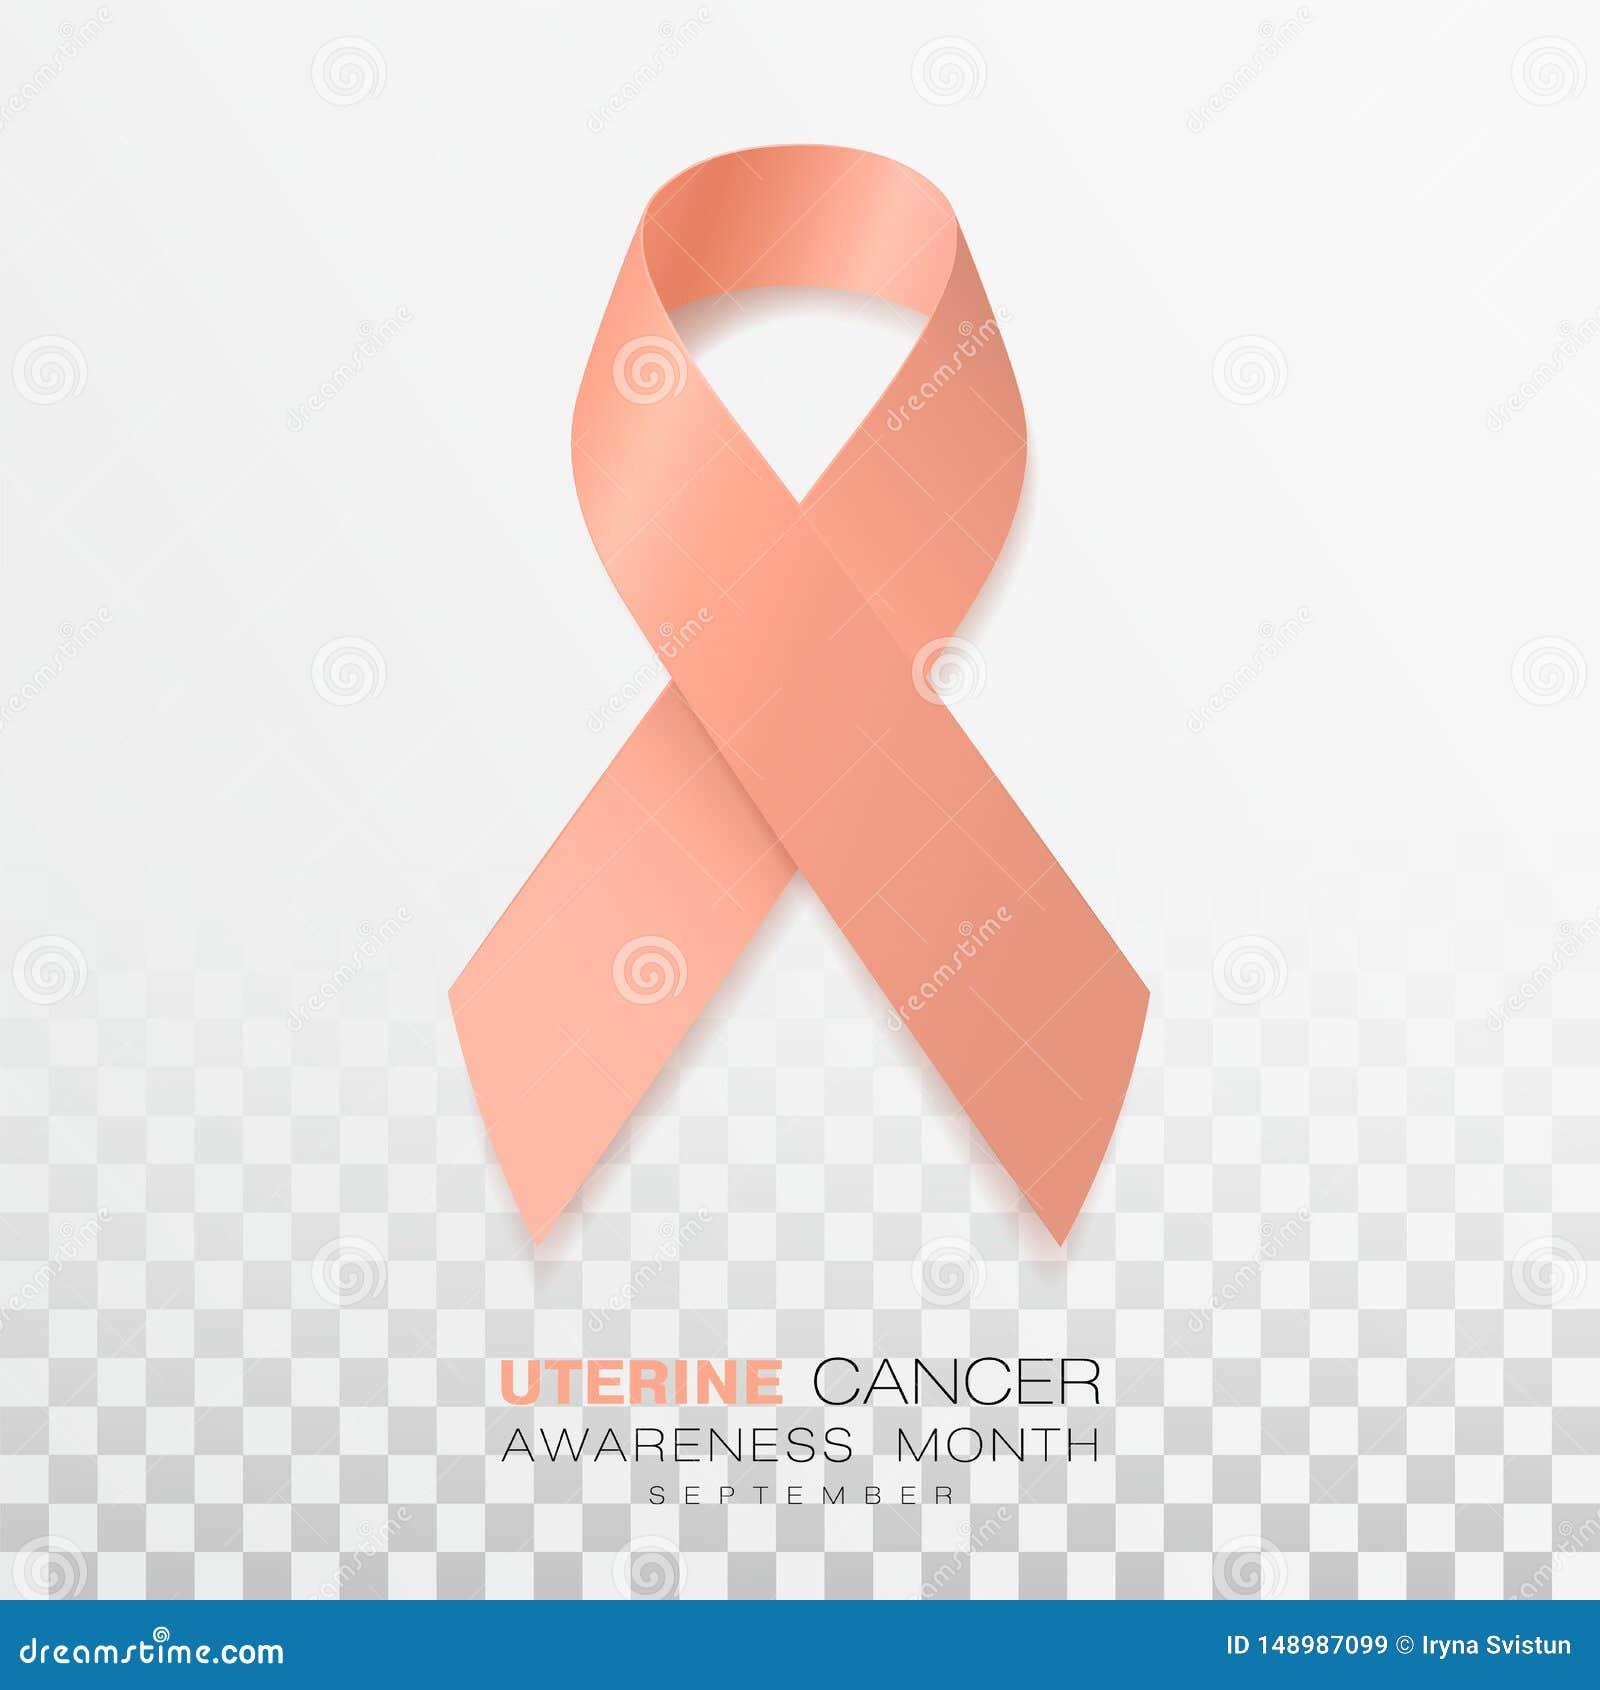 Endometrial cancer ribbon - Uterine cancer ribbon color. - Pancreatic cancer ribbon